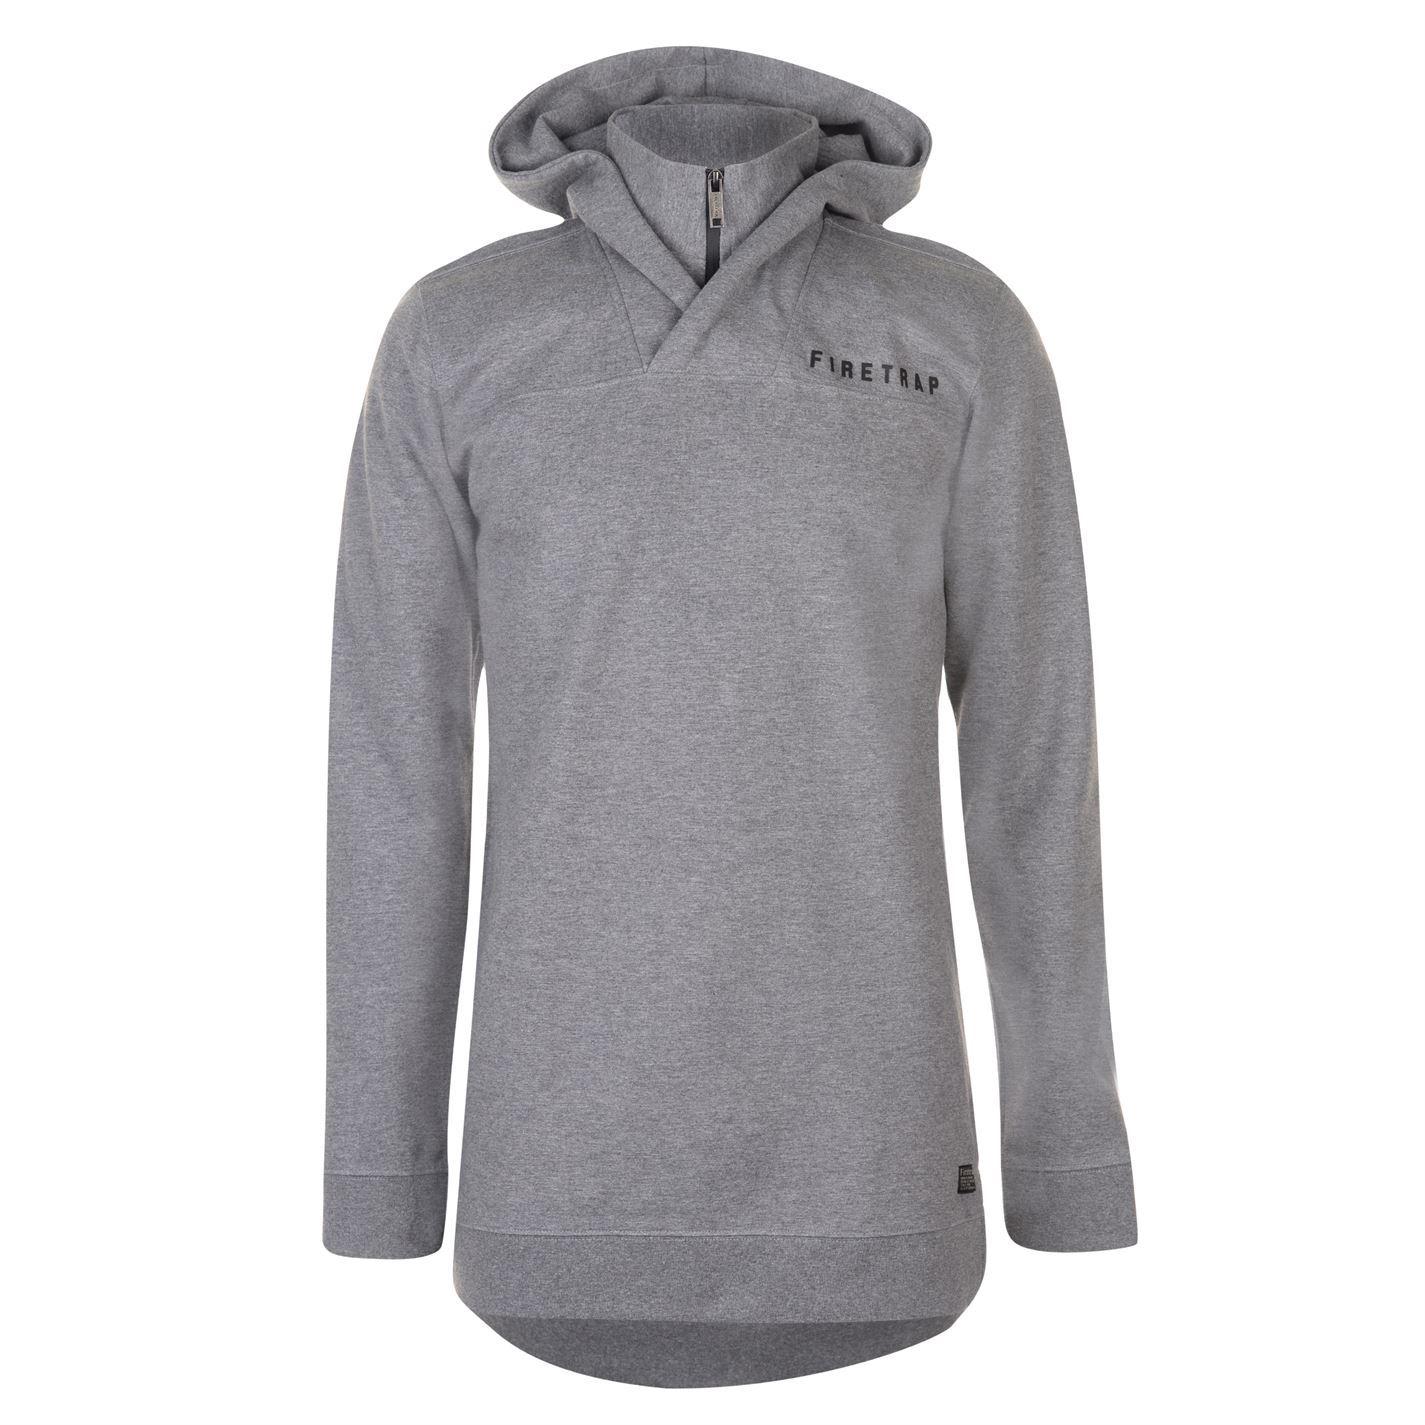 38a84038d ... Firetrap Interlock Longline Pullover Hoody Mens Charcoal Grey Hoodie  Sweatshirt ...